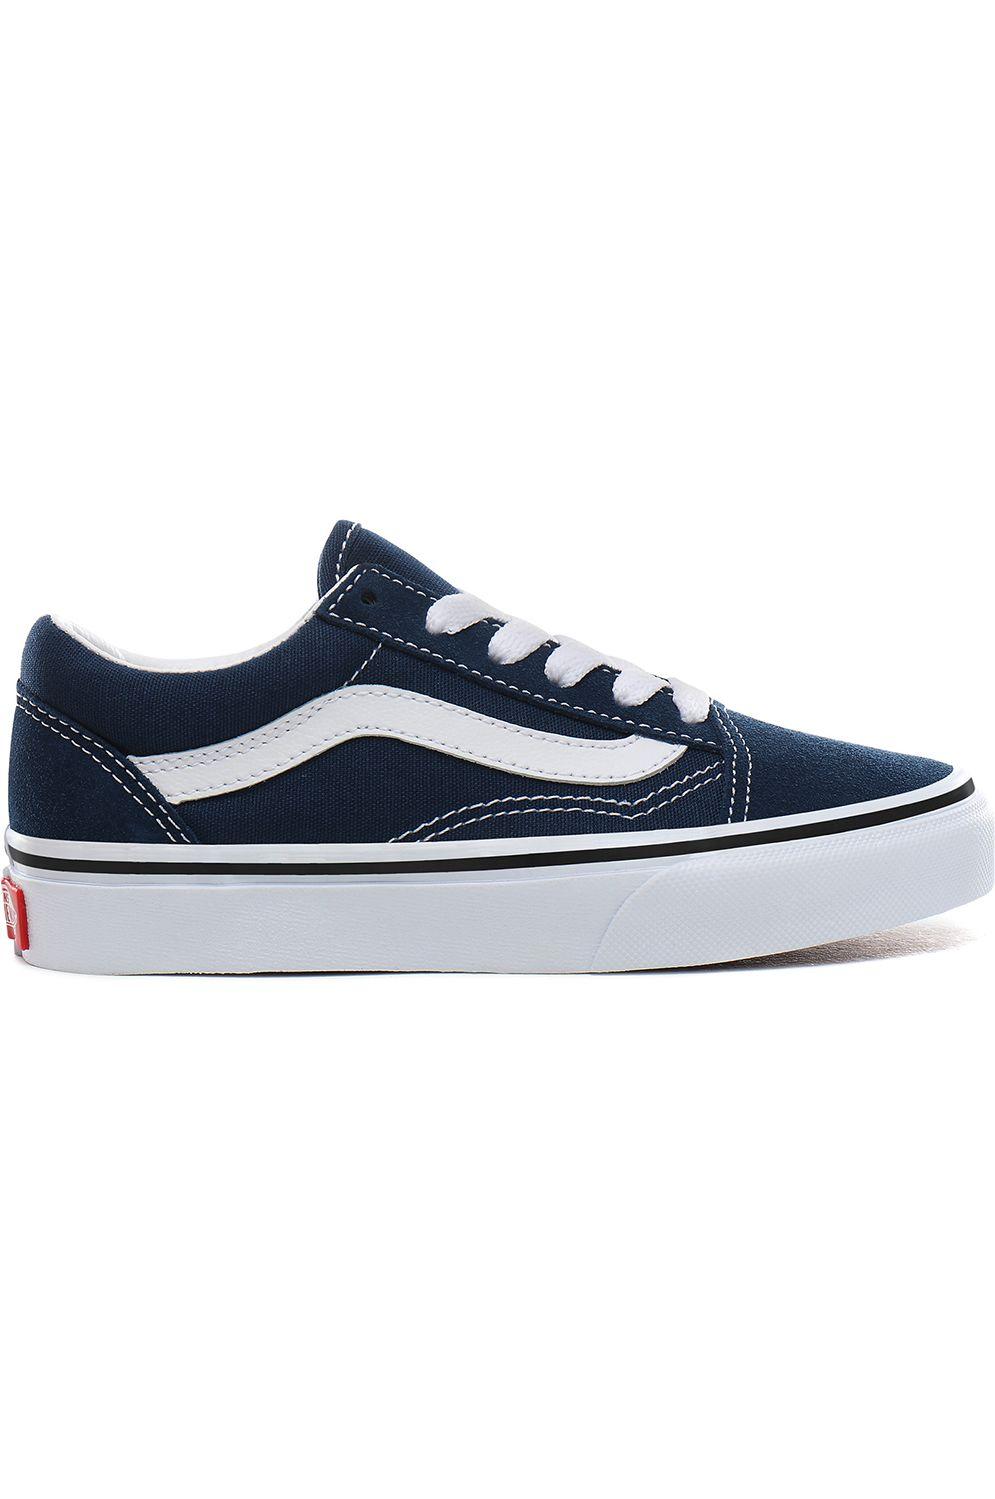 Vans Shoes OLD SKOOL Gibraltar Sea/True White